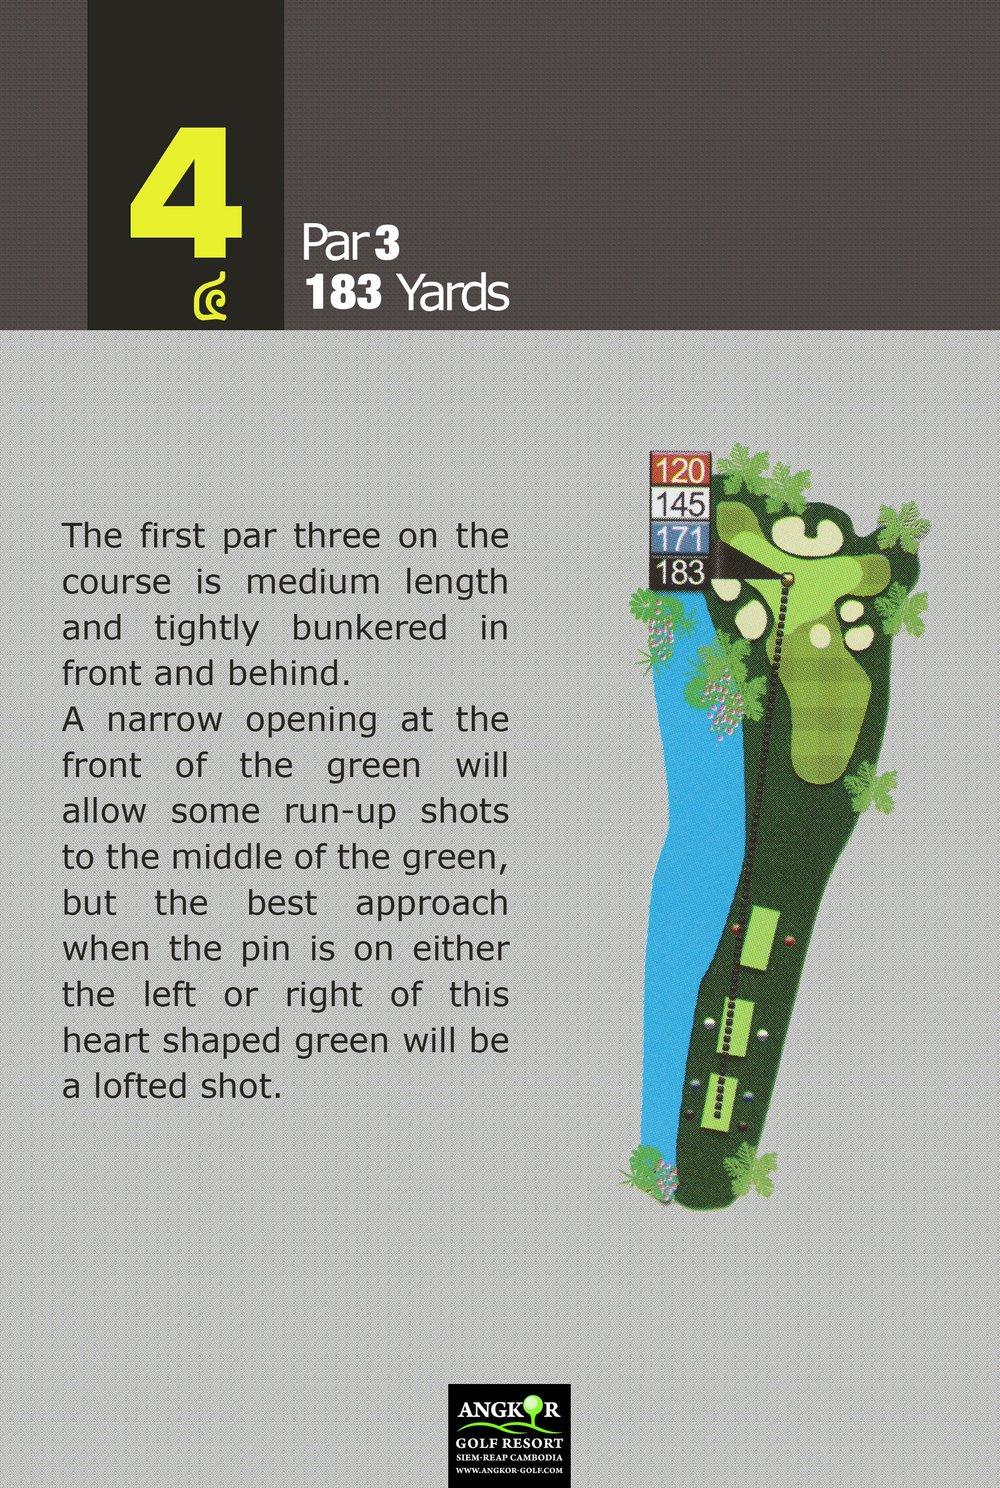 Hole 4 - Par 3 183 Yards